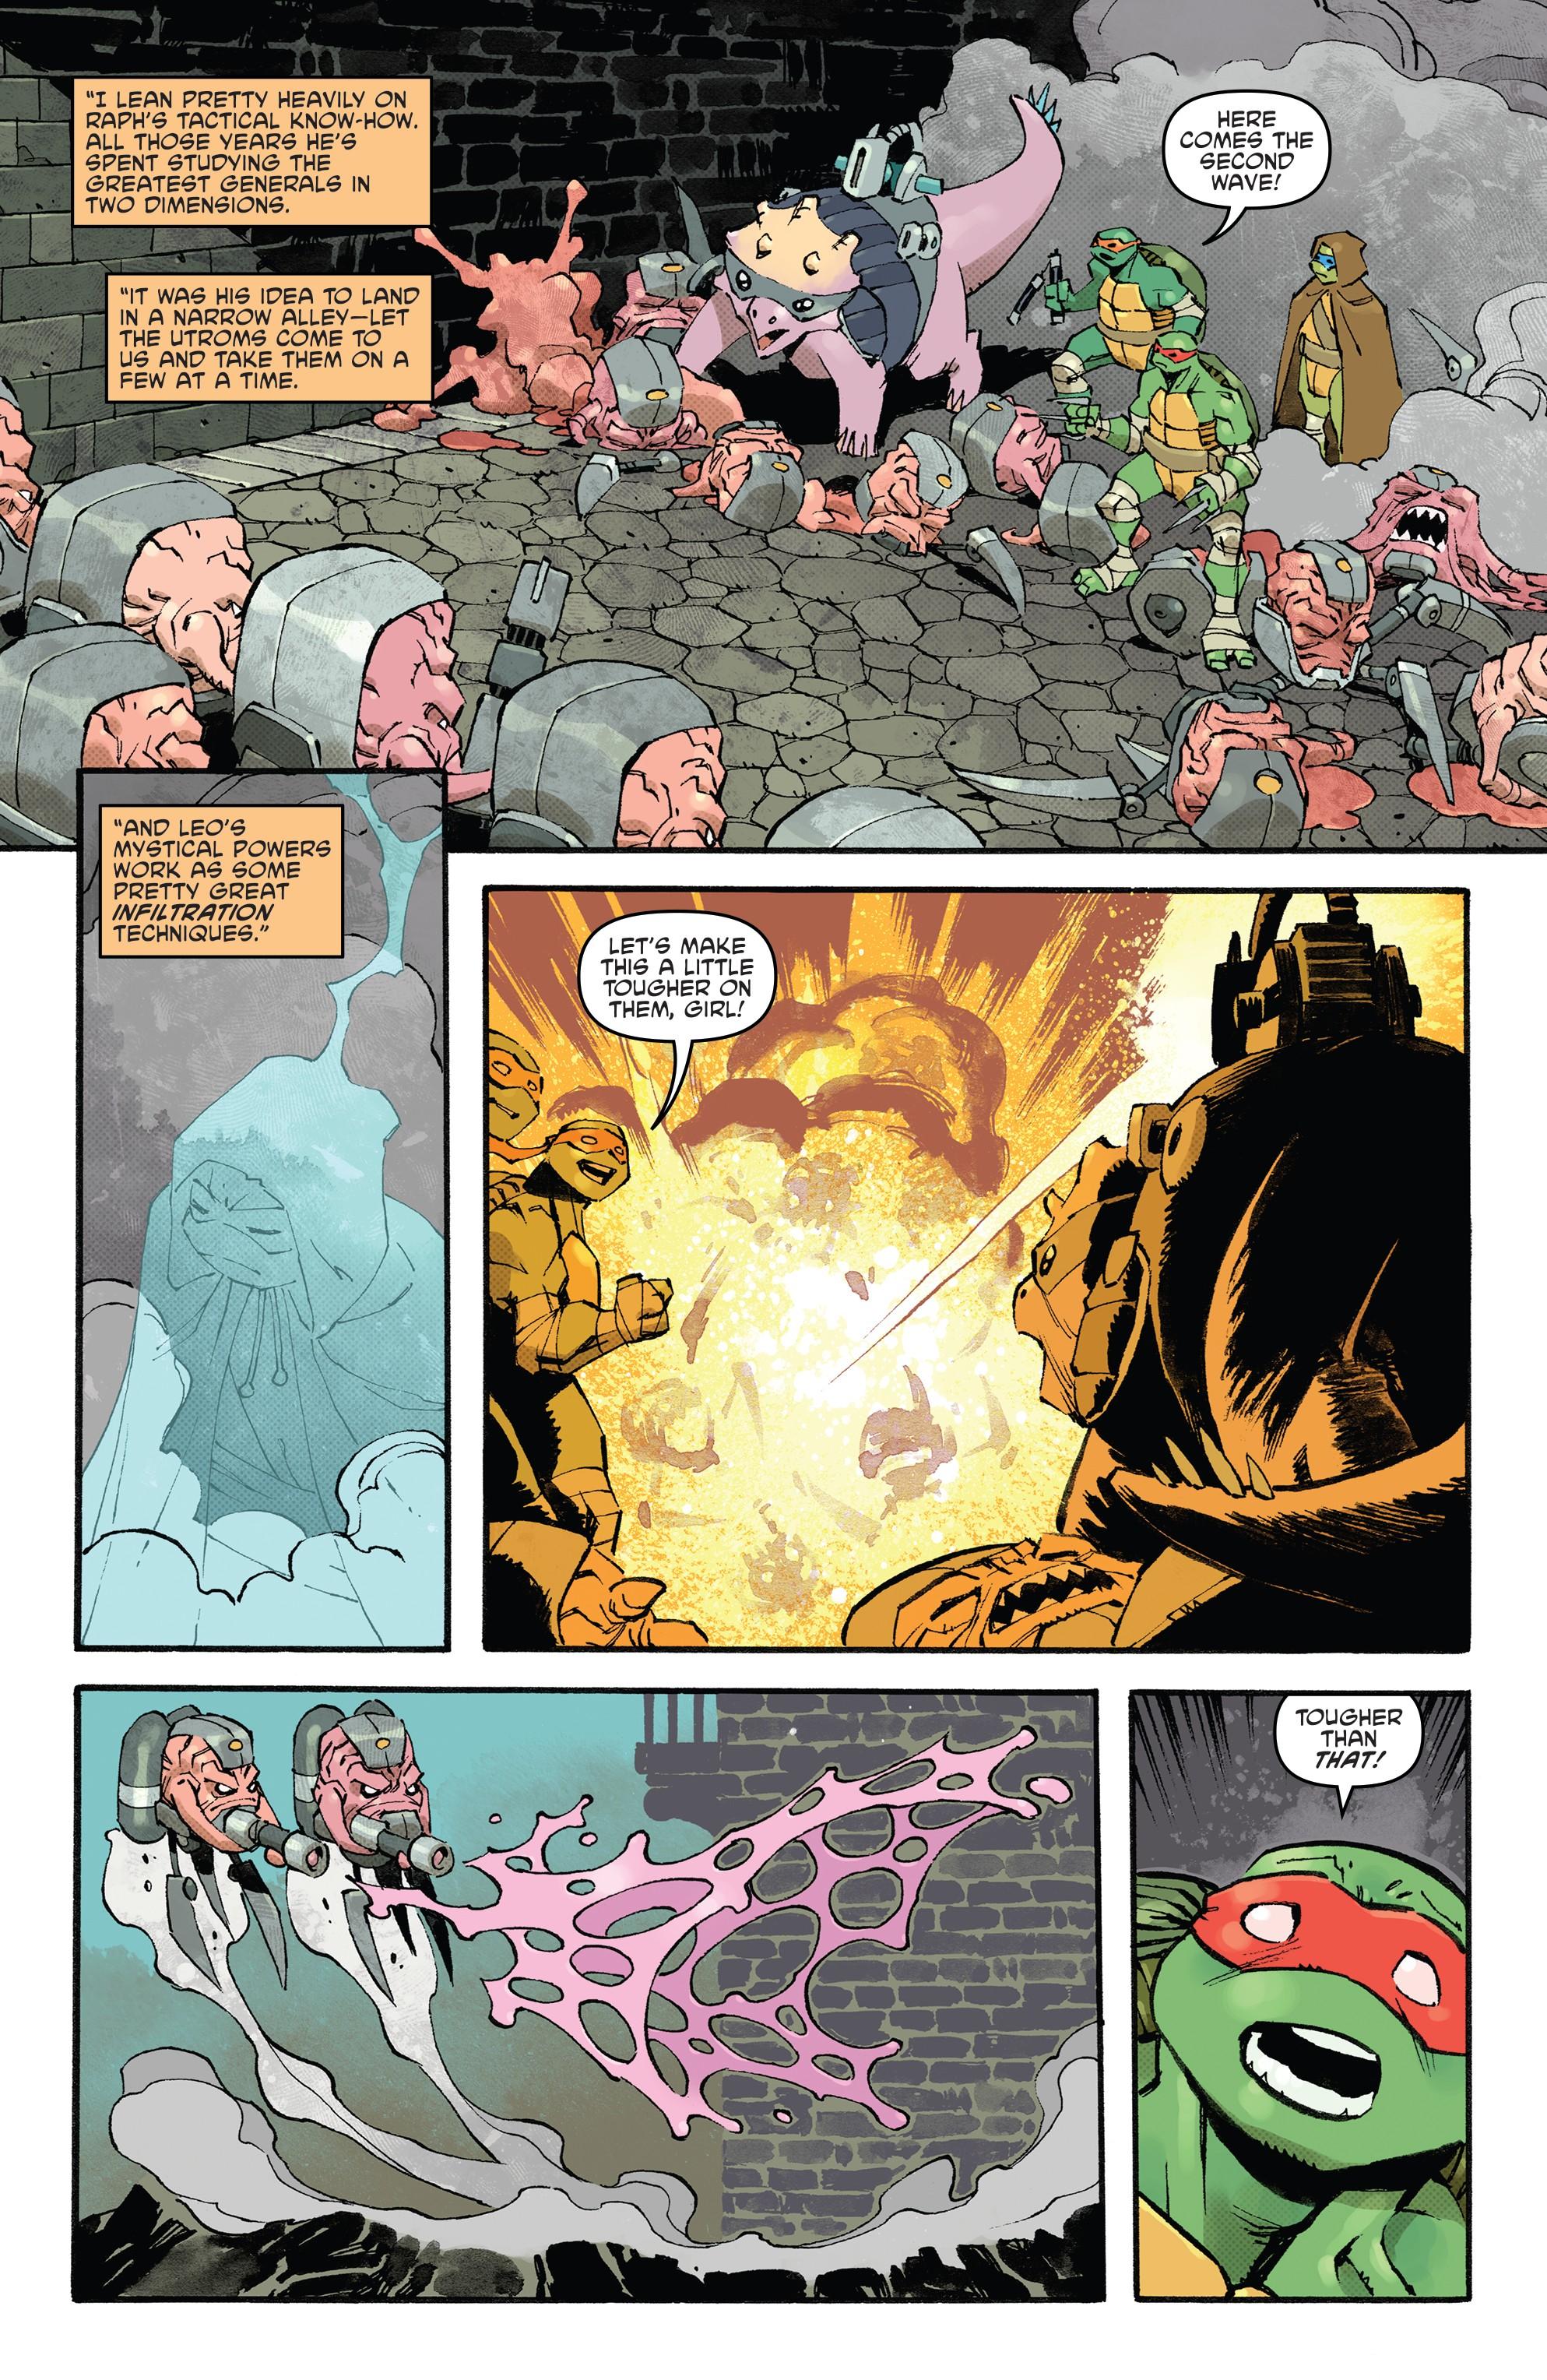 Teenage Mutant Ninja Turtles: IDW 20/20 (2019) Chapter 1